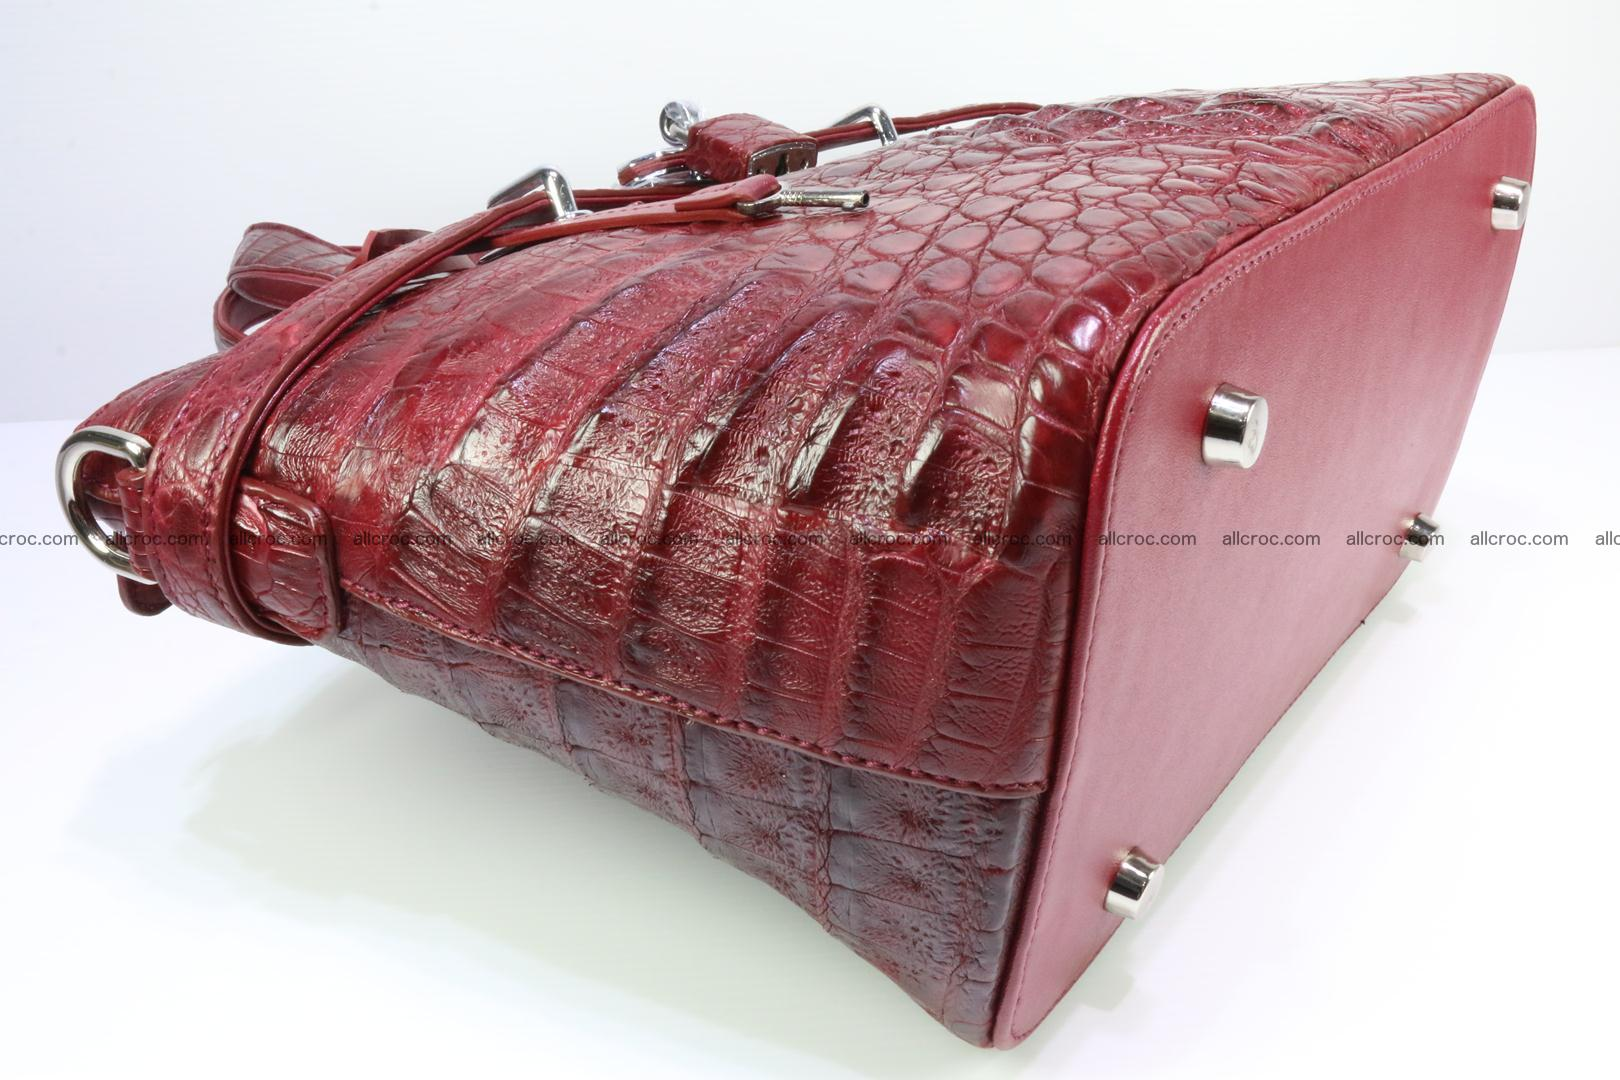 Genuine crocodile handbag for ladies 046 Foto 11